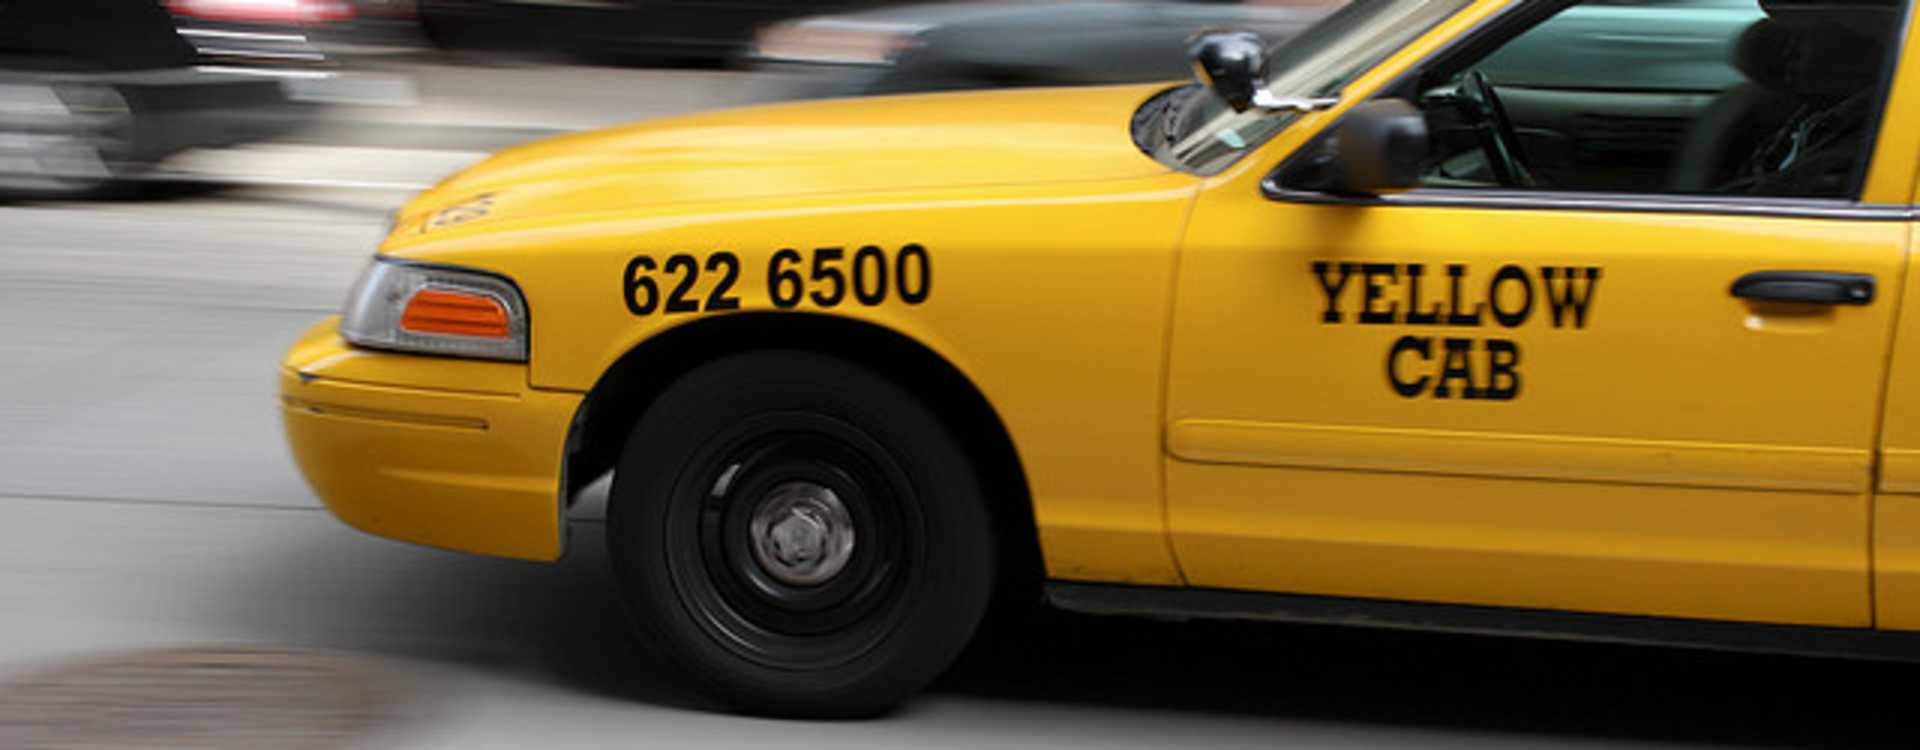 Yellow_Cab-2.jpg